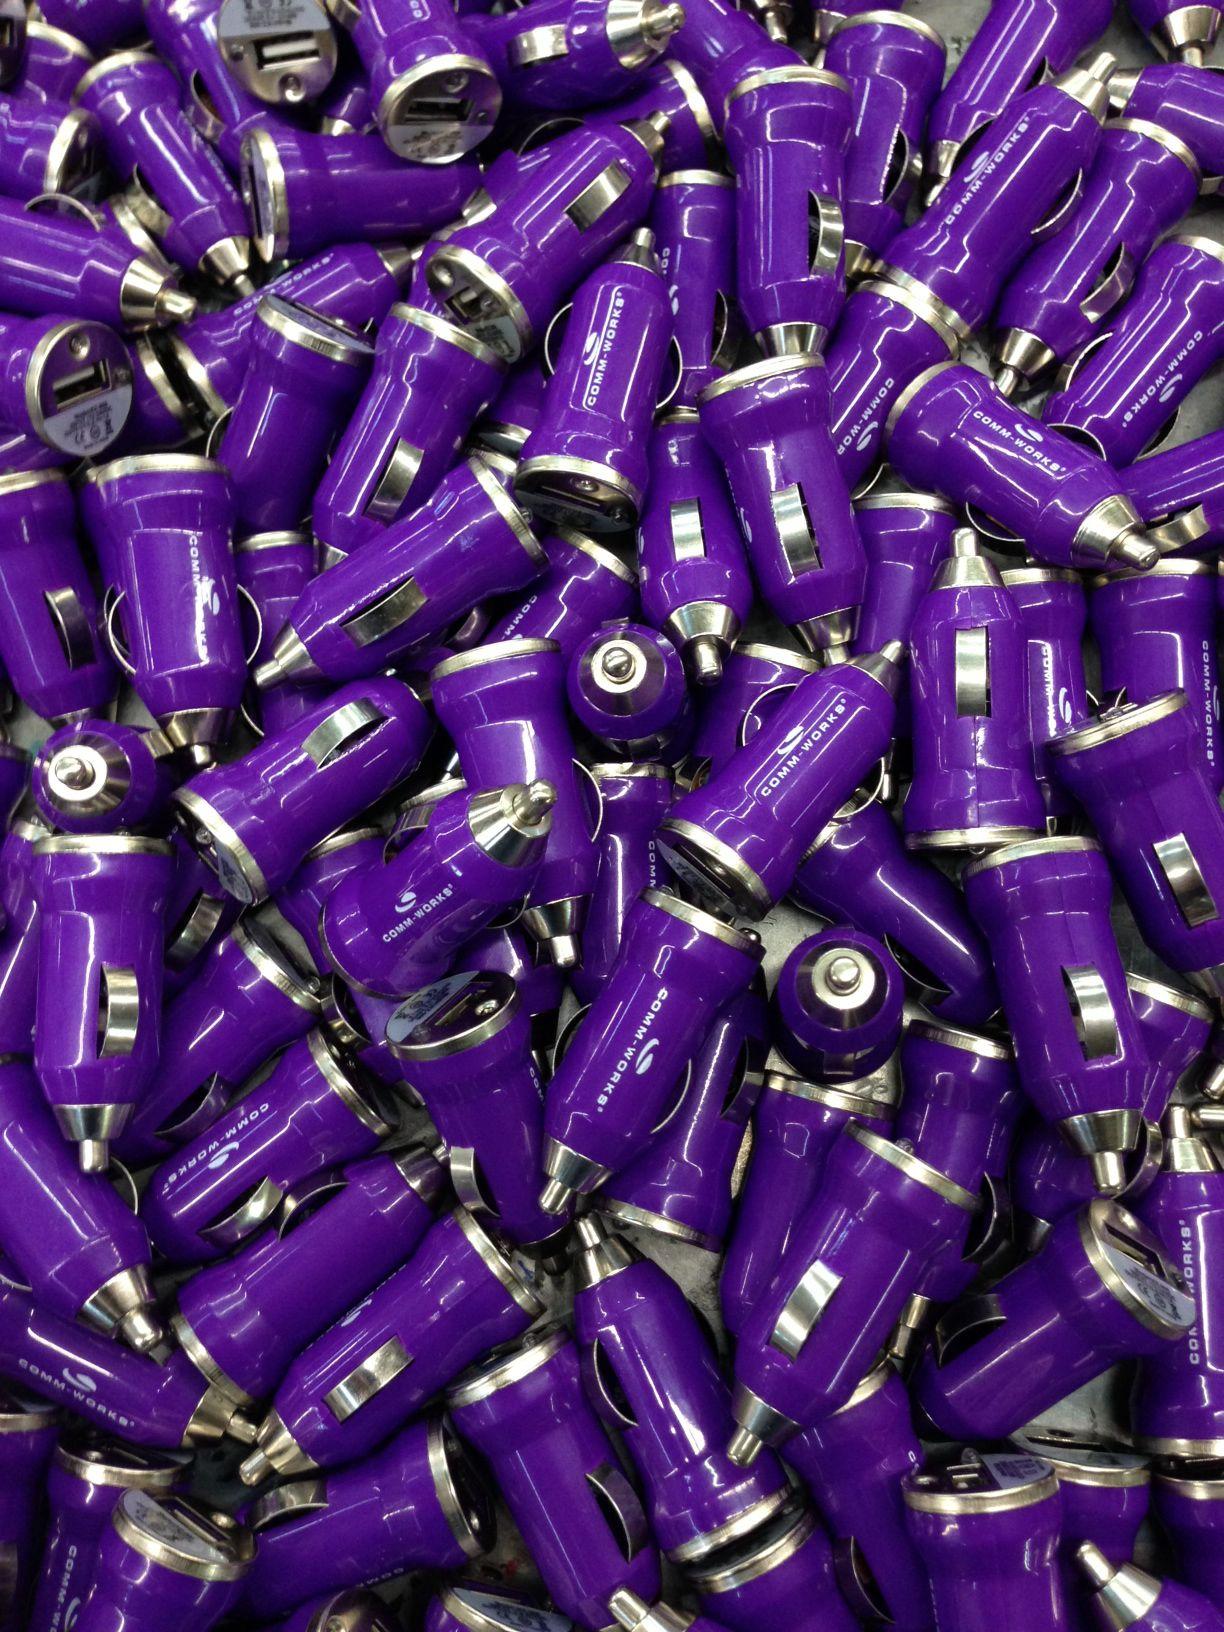 Got purple? We do.... and orange, black, white, red, lime